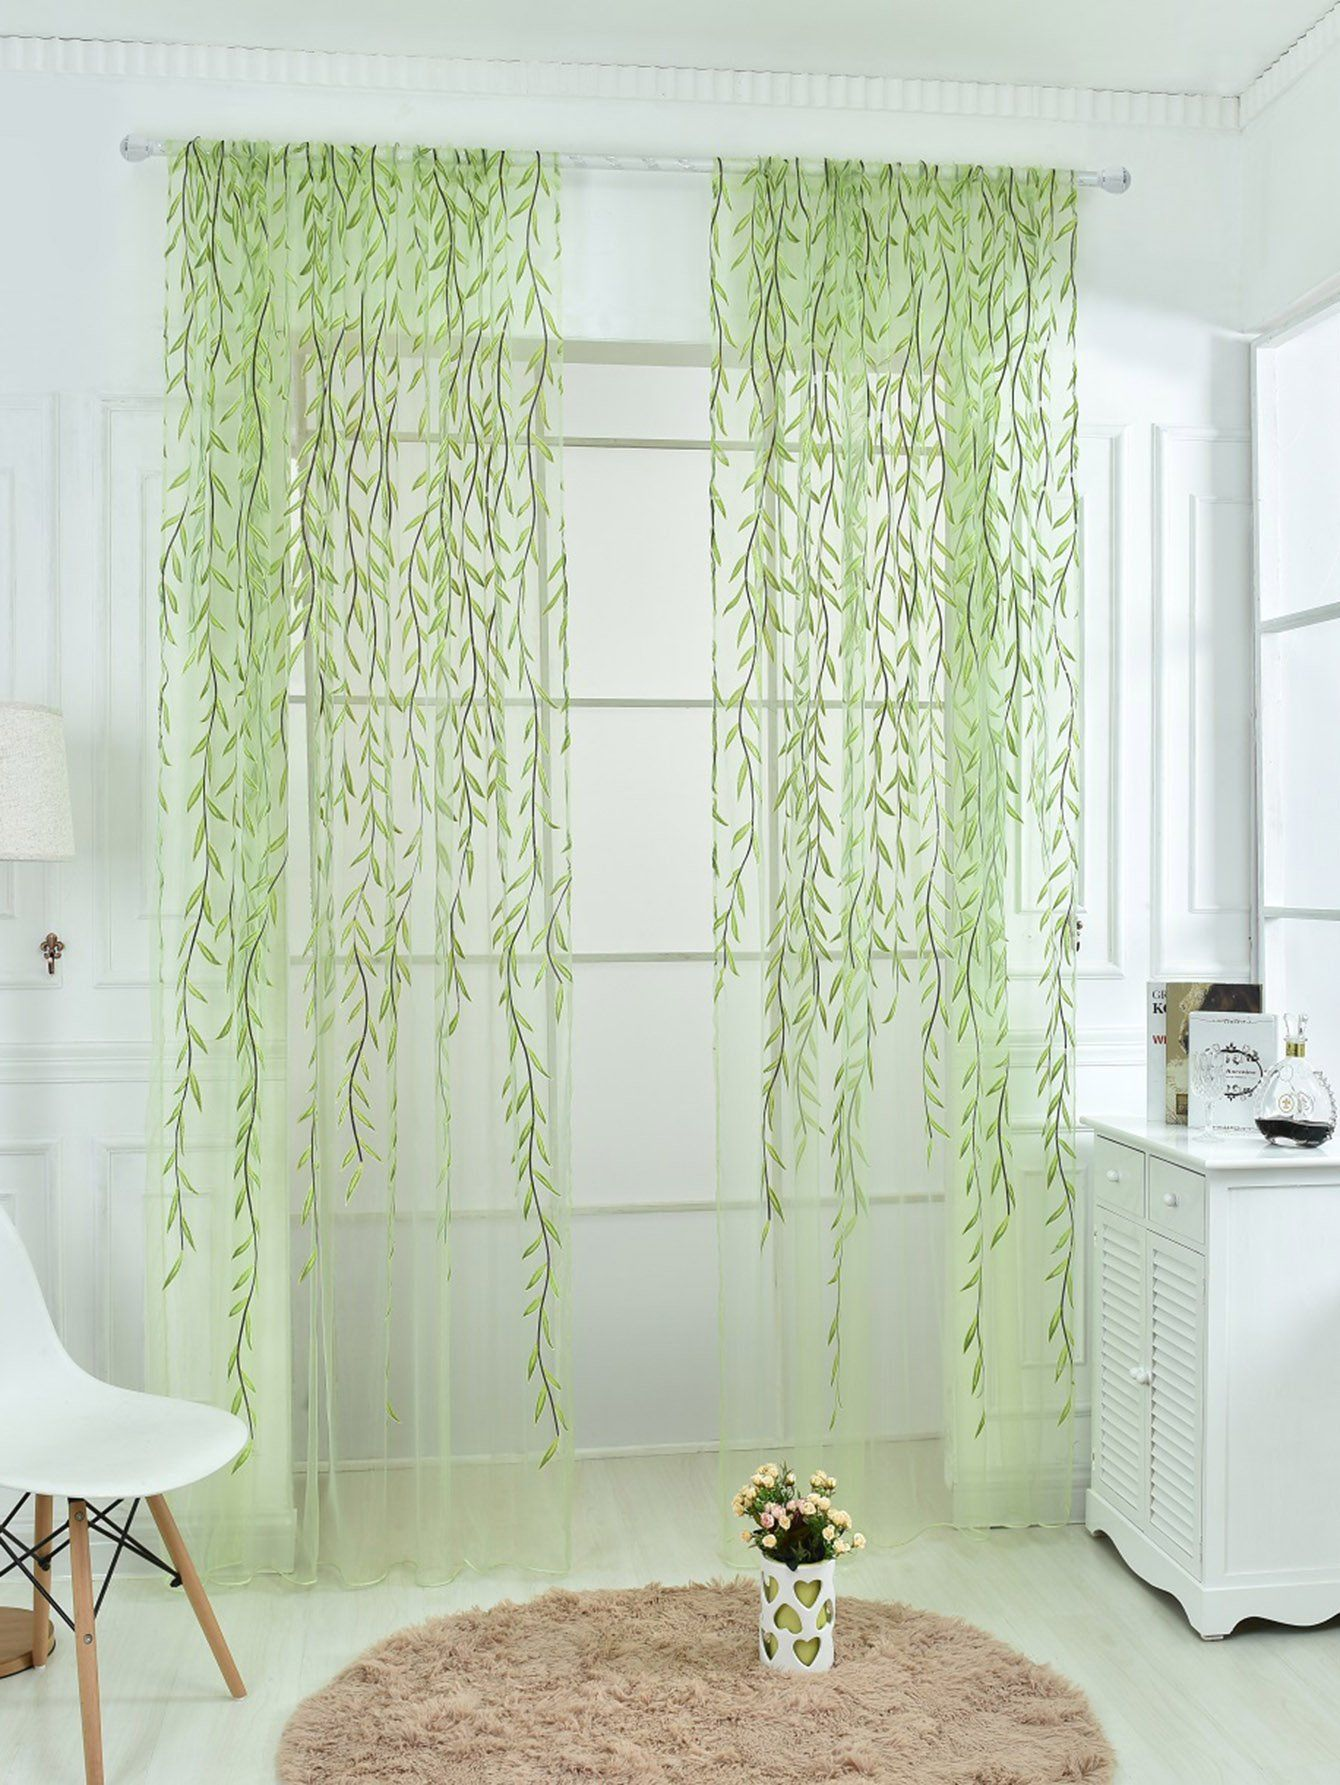 beige in drapes window diamante mesh blend n treatments cotton sheer panel elements b curtains taupe l curtain pair grommet burnout